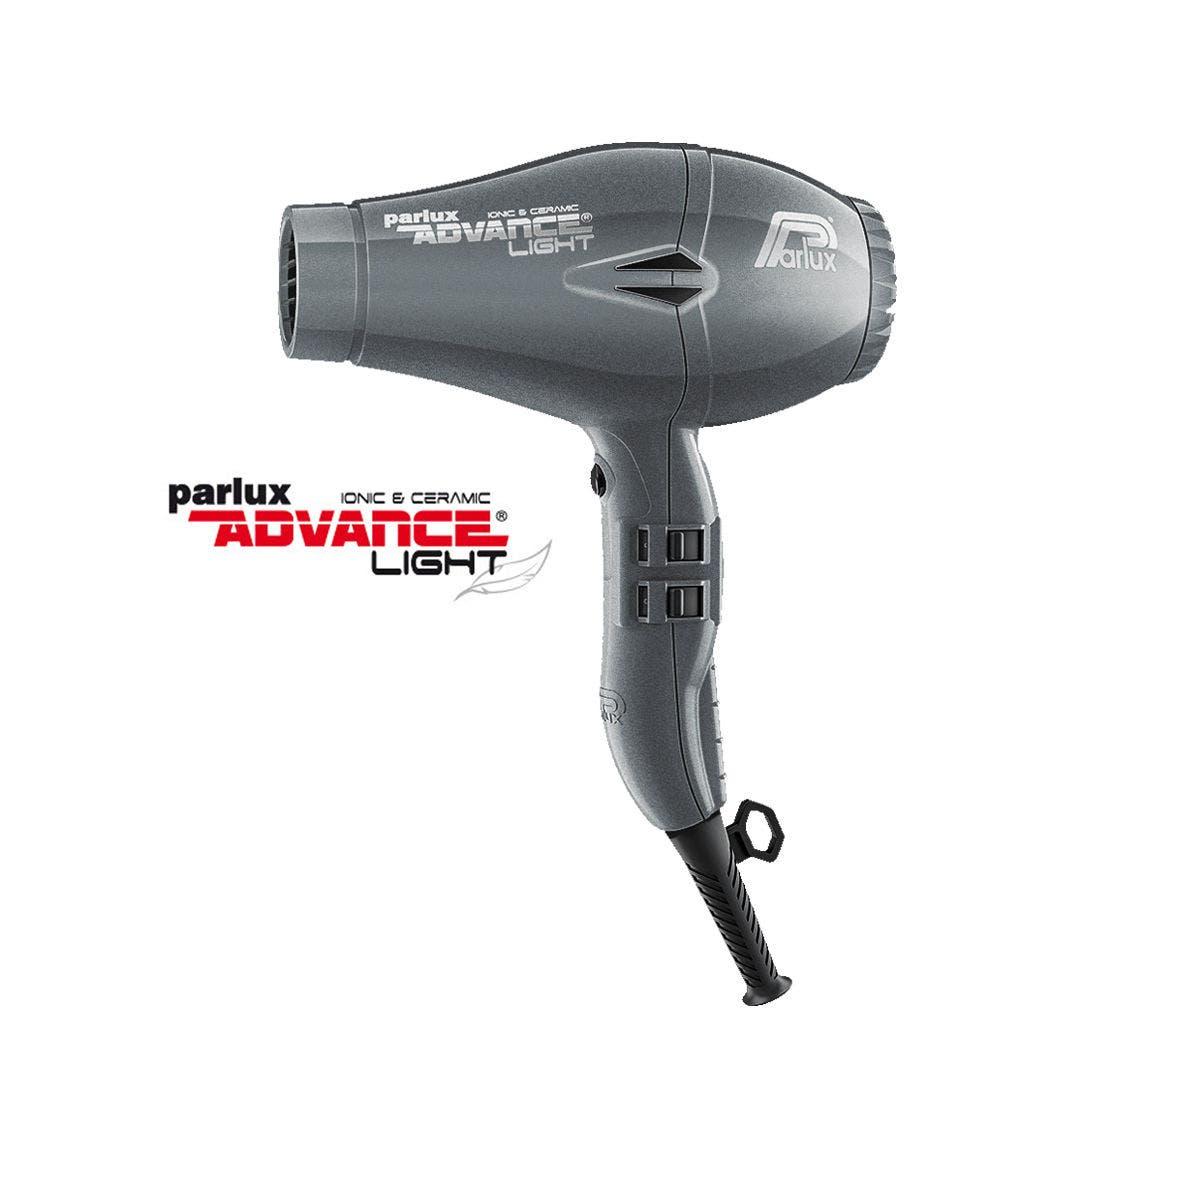 Parlux ADVANCE Light Hair Dryer Ionic & Ceramic - Graphite